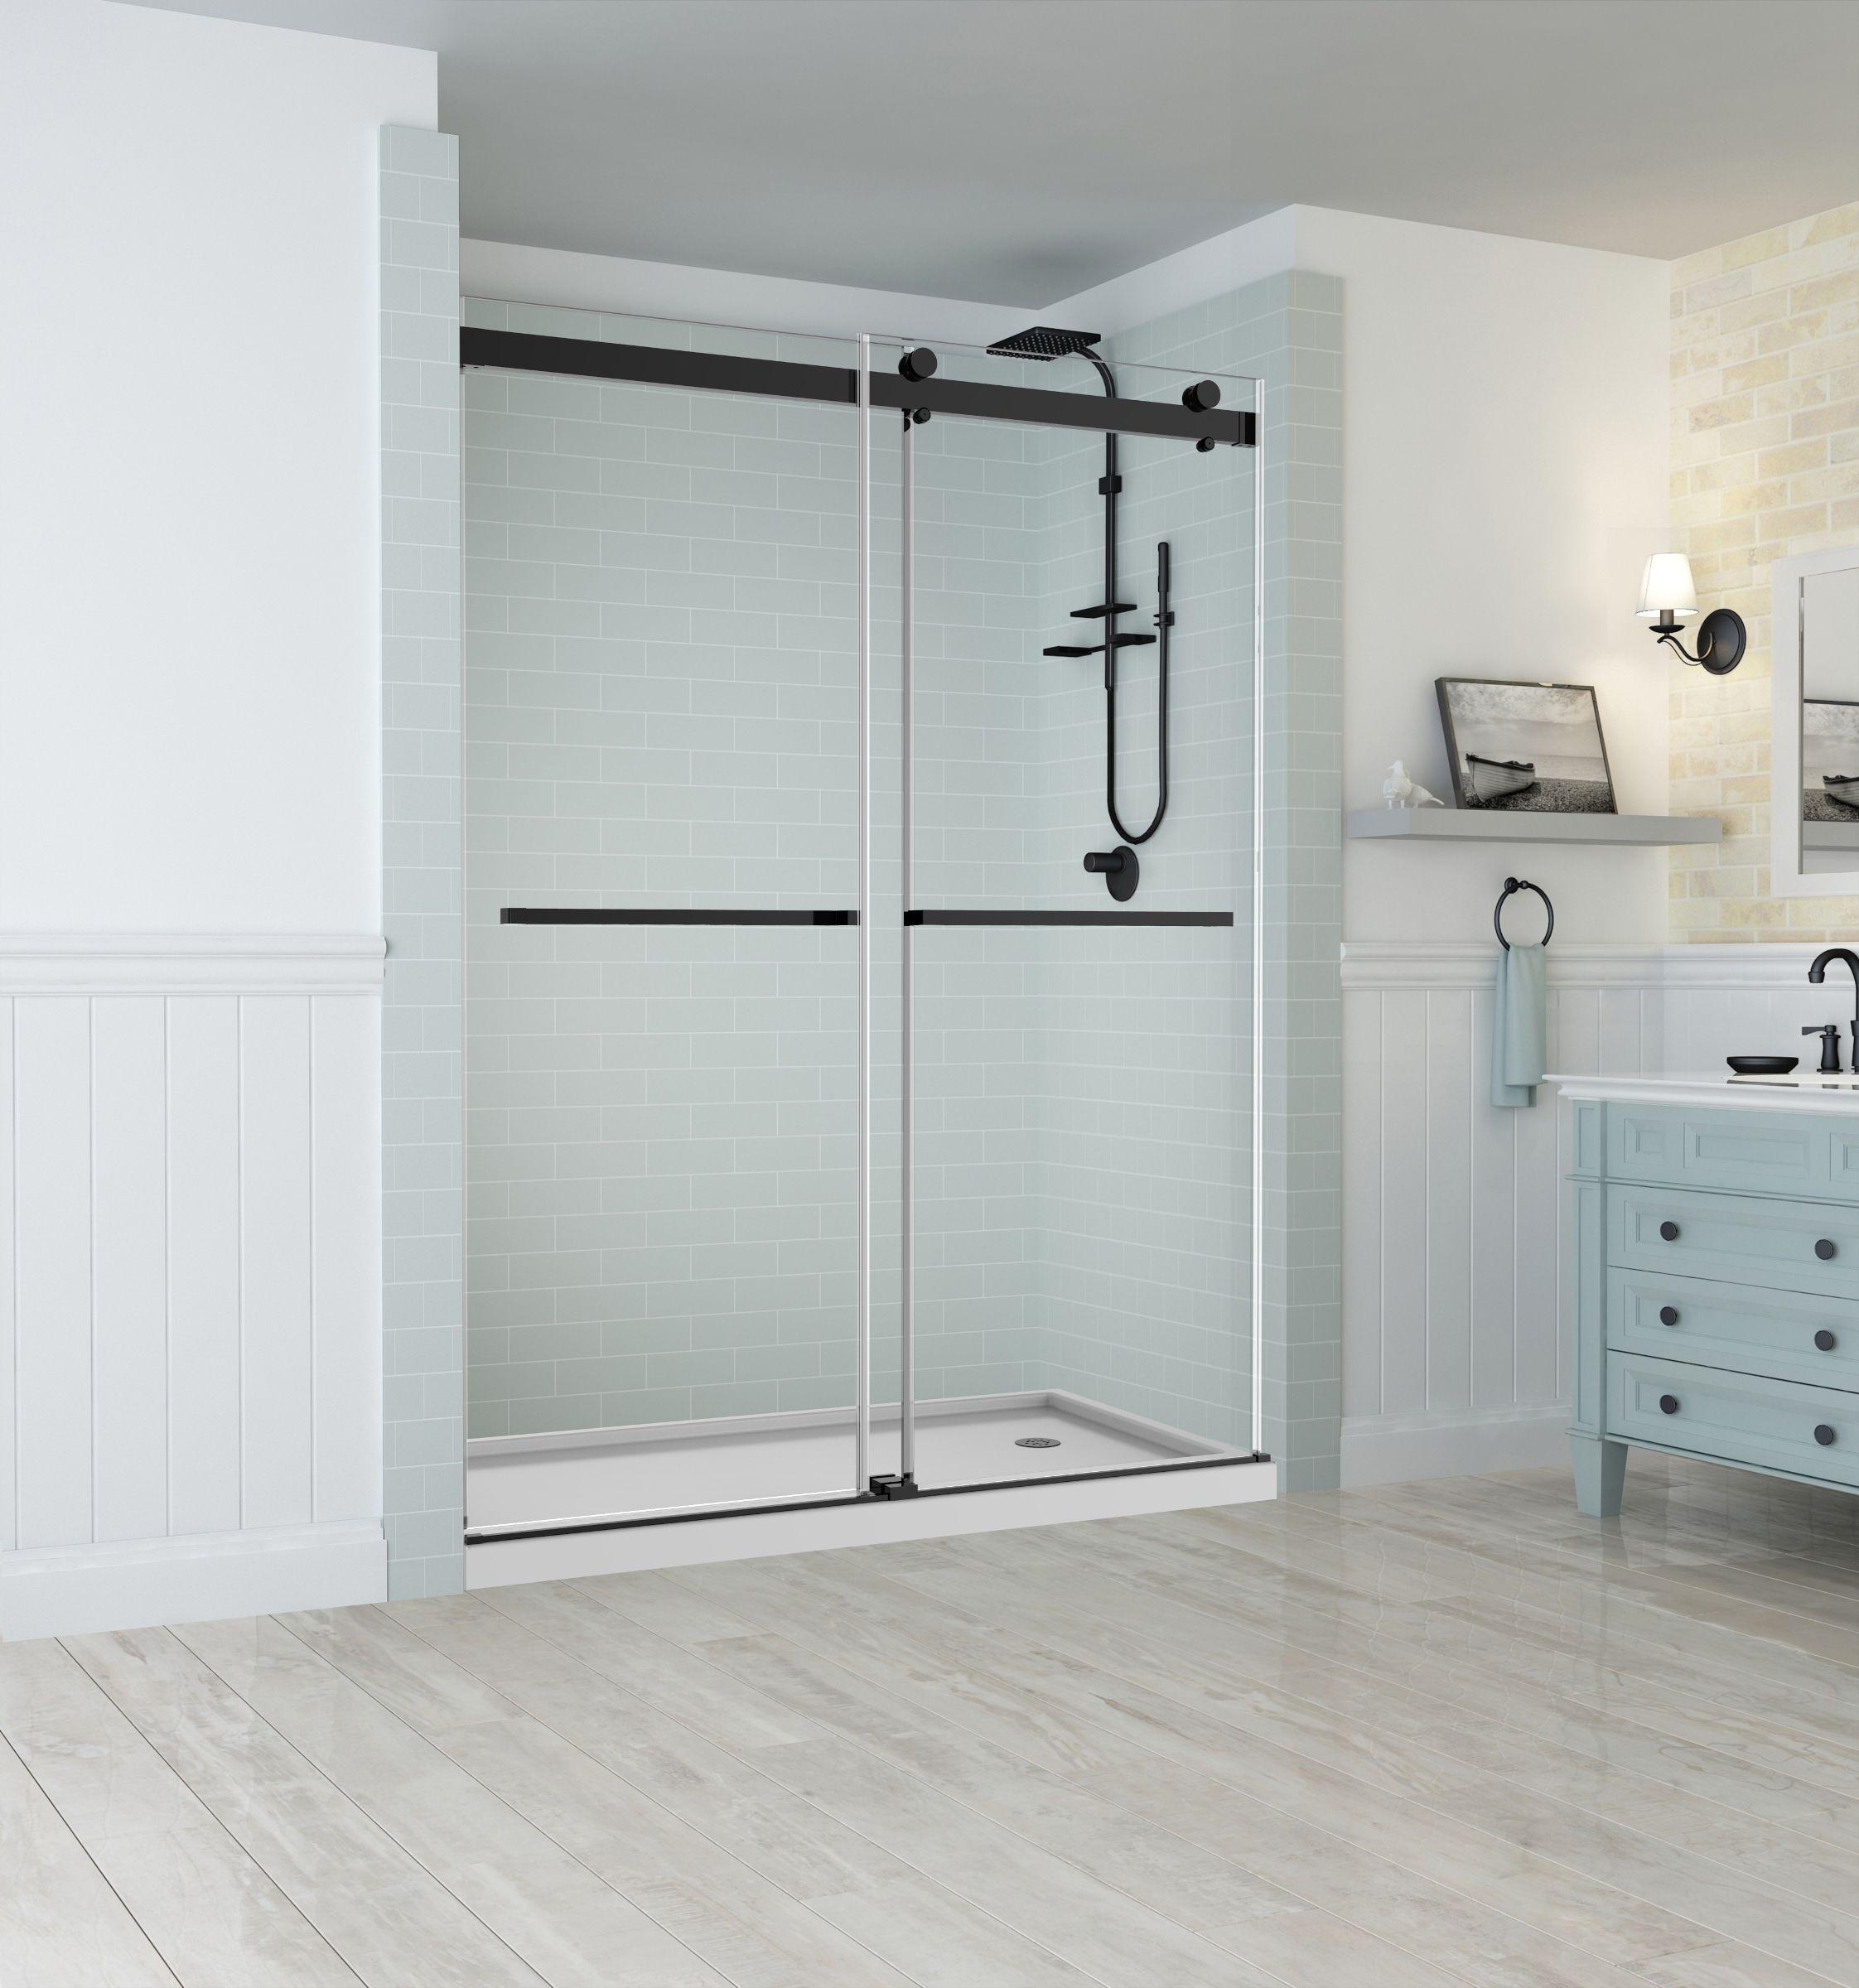 Sdr977 Rivage Frameless Dual Bypass Sliding Shower Door With Starcast Coating Shower Doors Sliding Shower Door Frameless Shower Doors